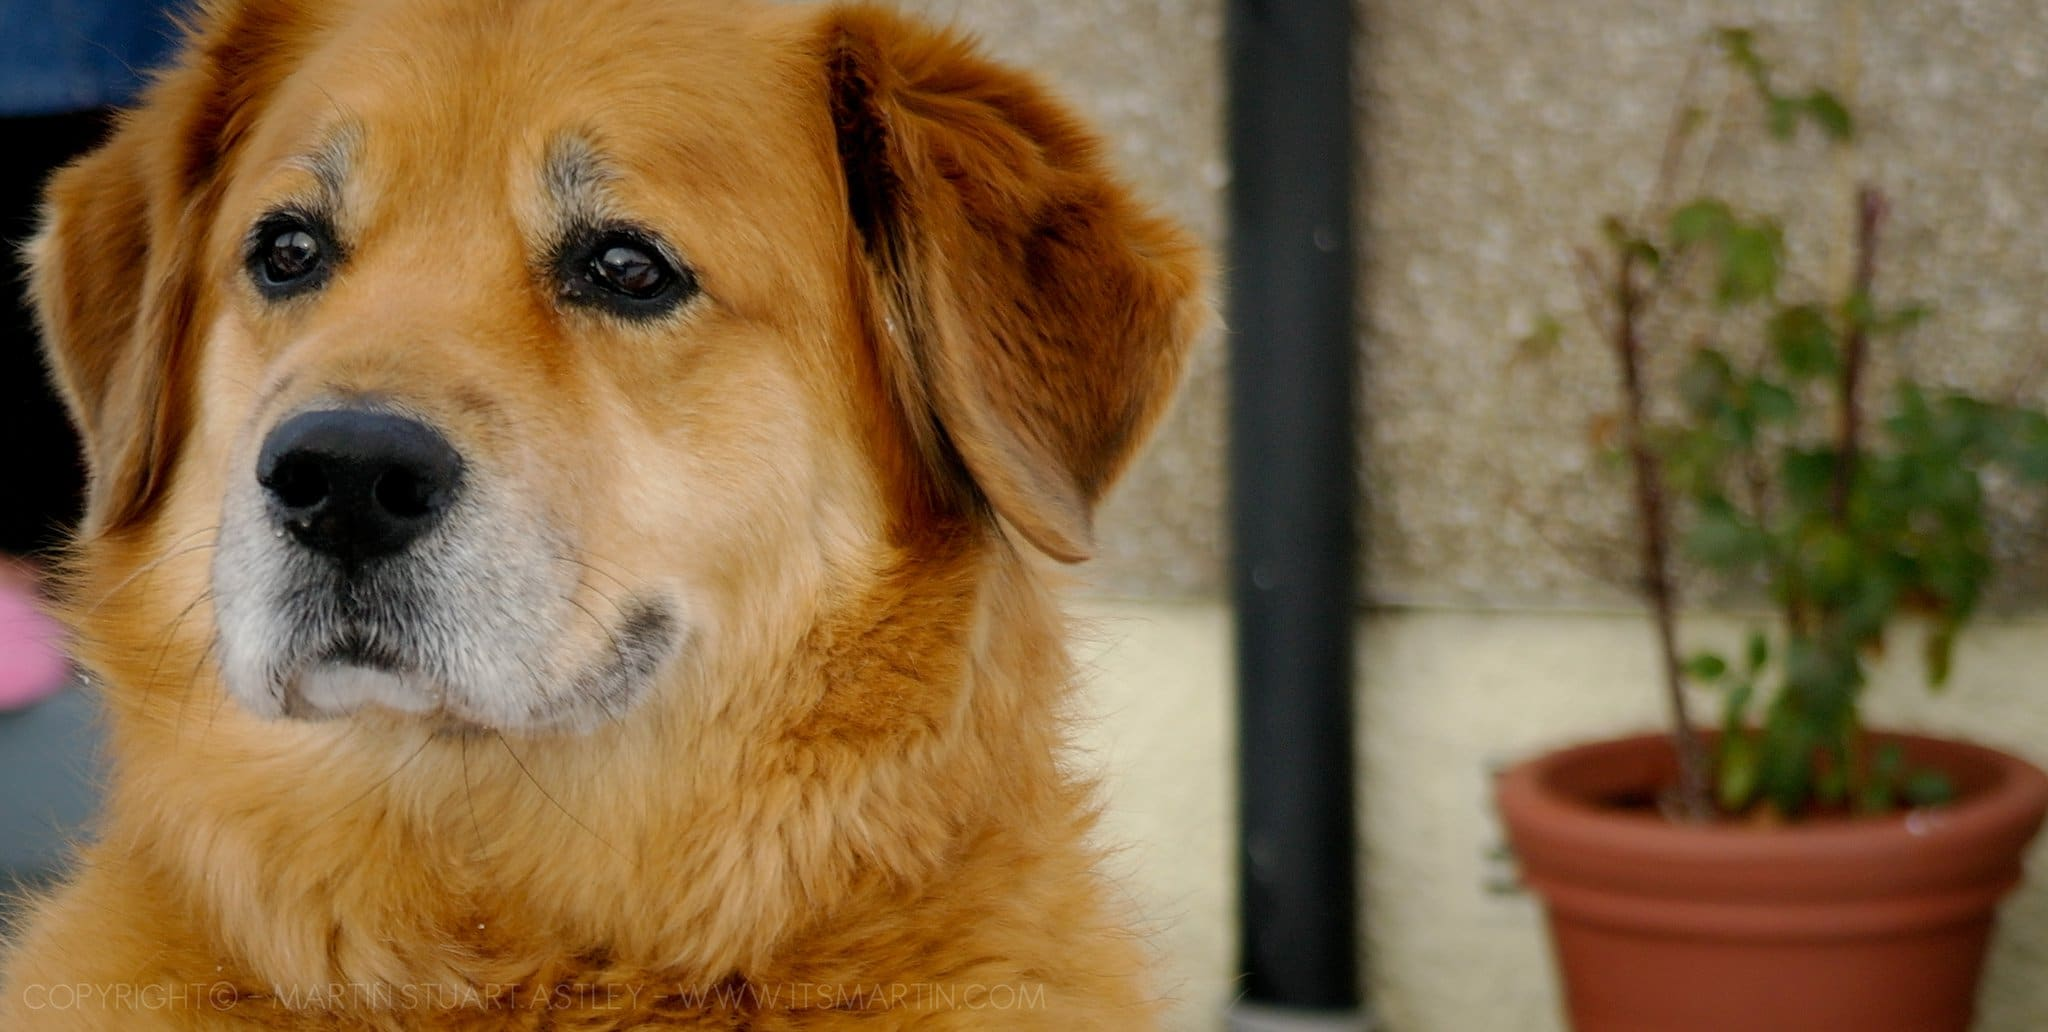 Estate Planning - puppy with blurred background